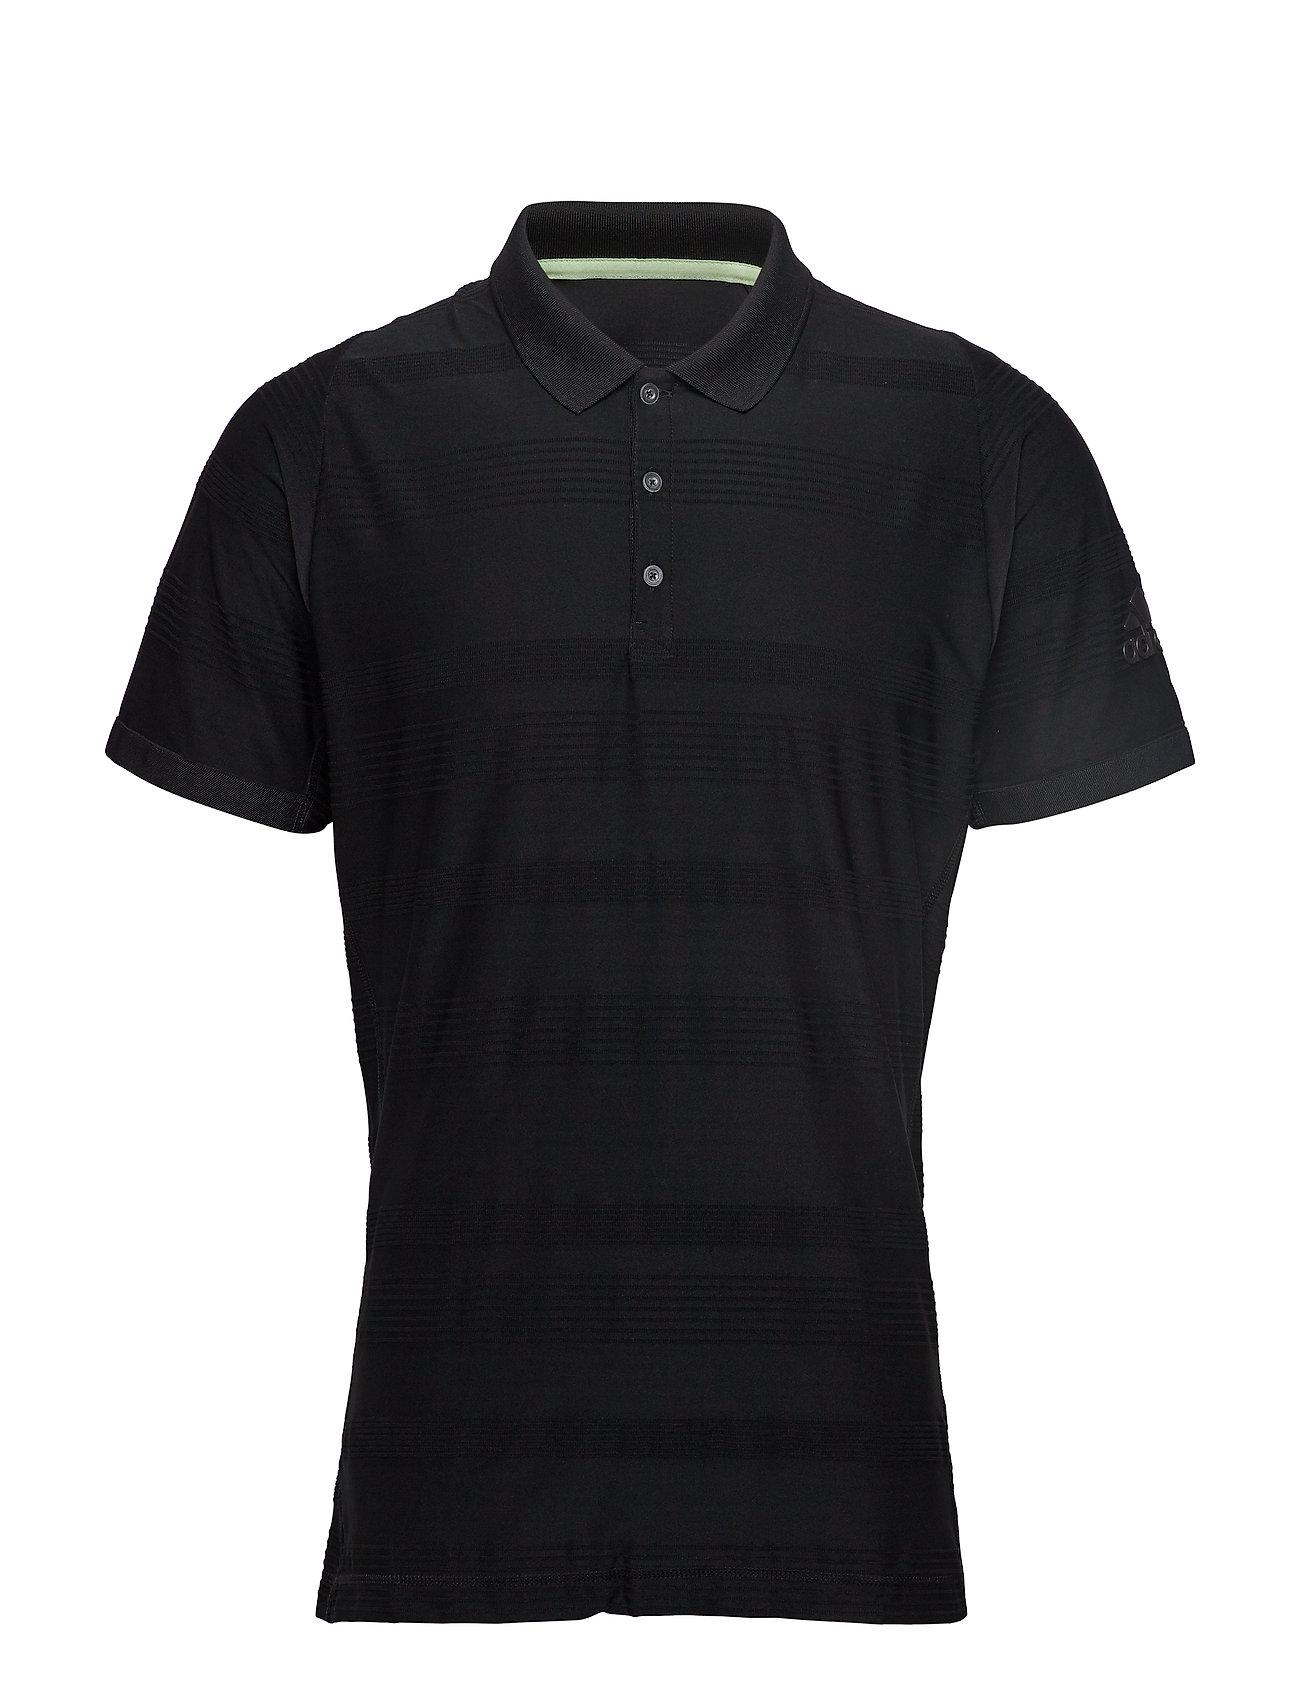 adidas Tennis MCODE POLO - BLACK